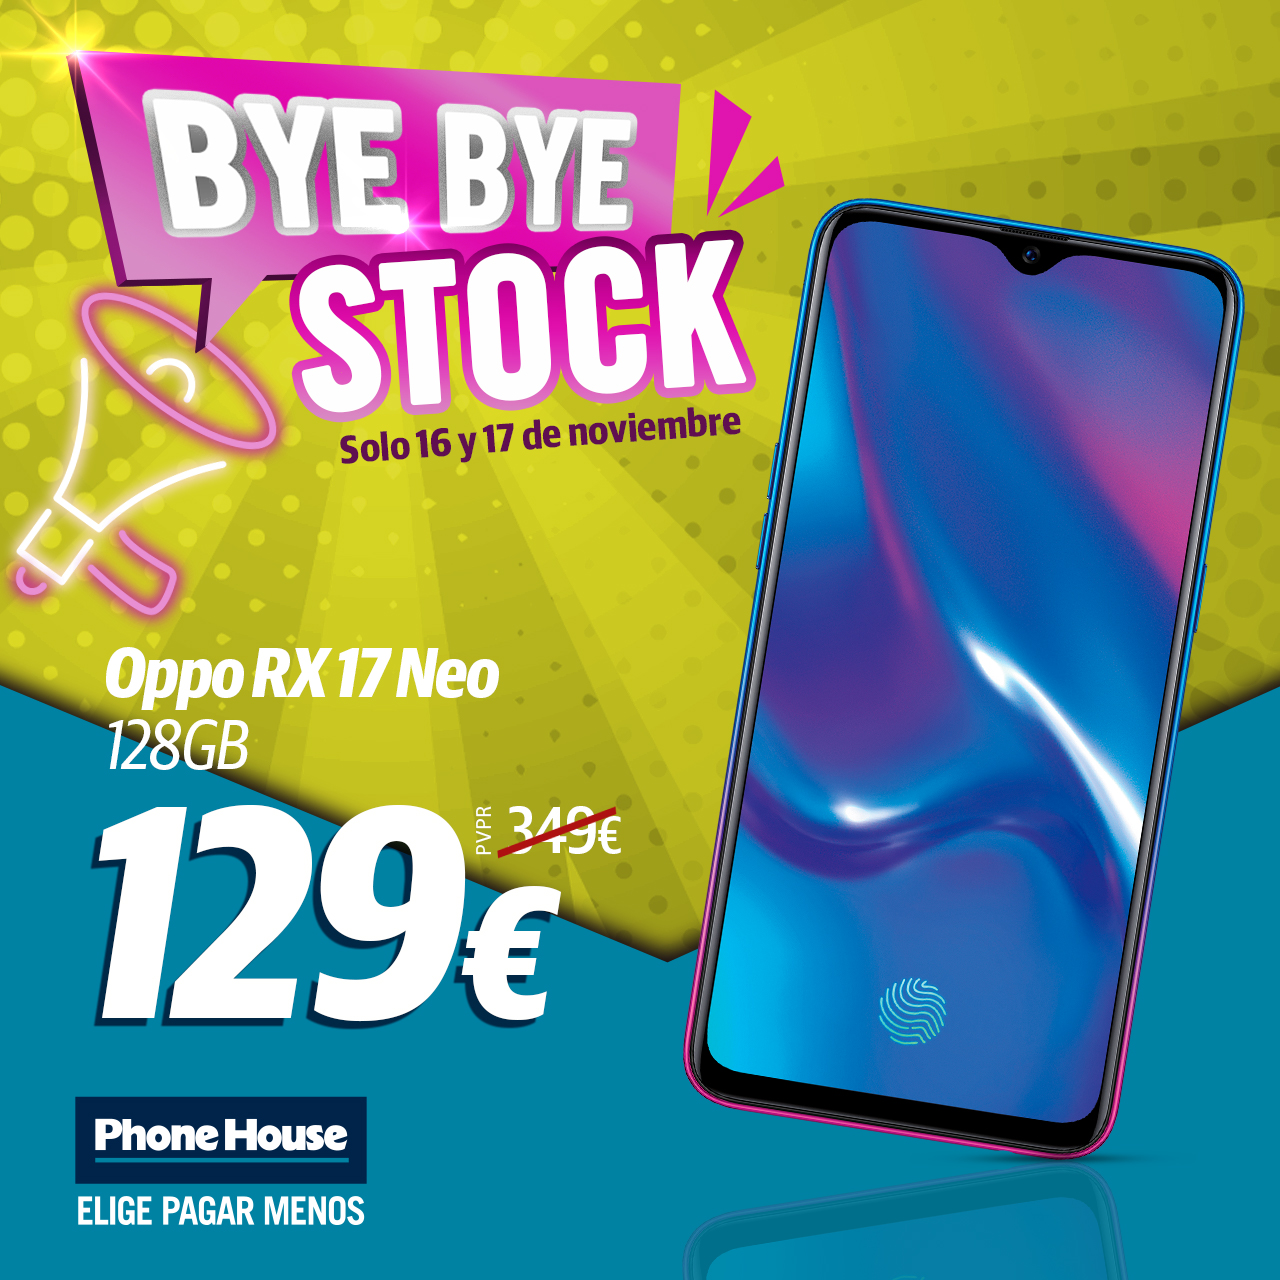 Rrss Bye Stock Prioridad 3 Smartphones